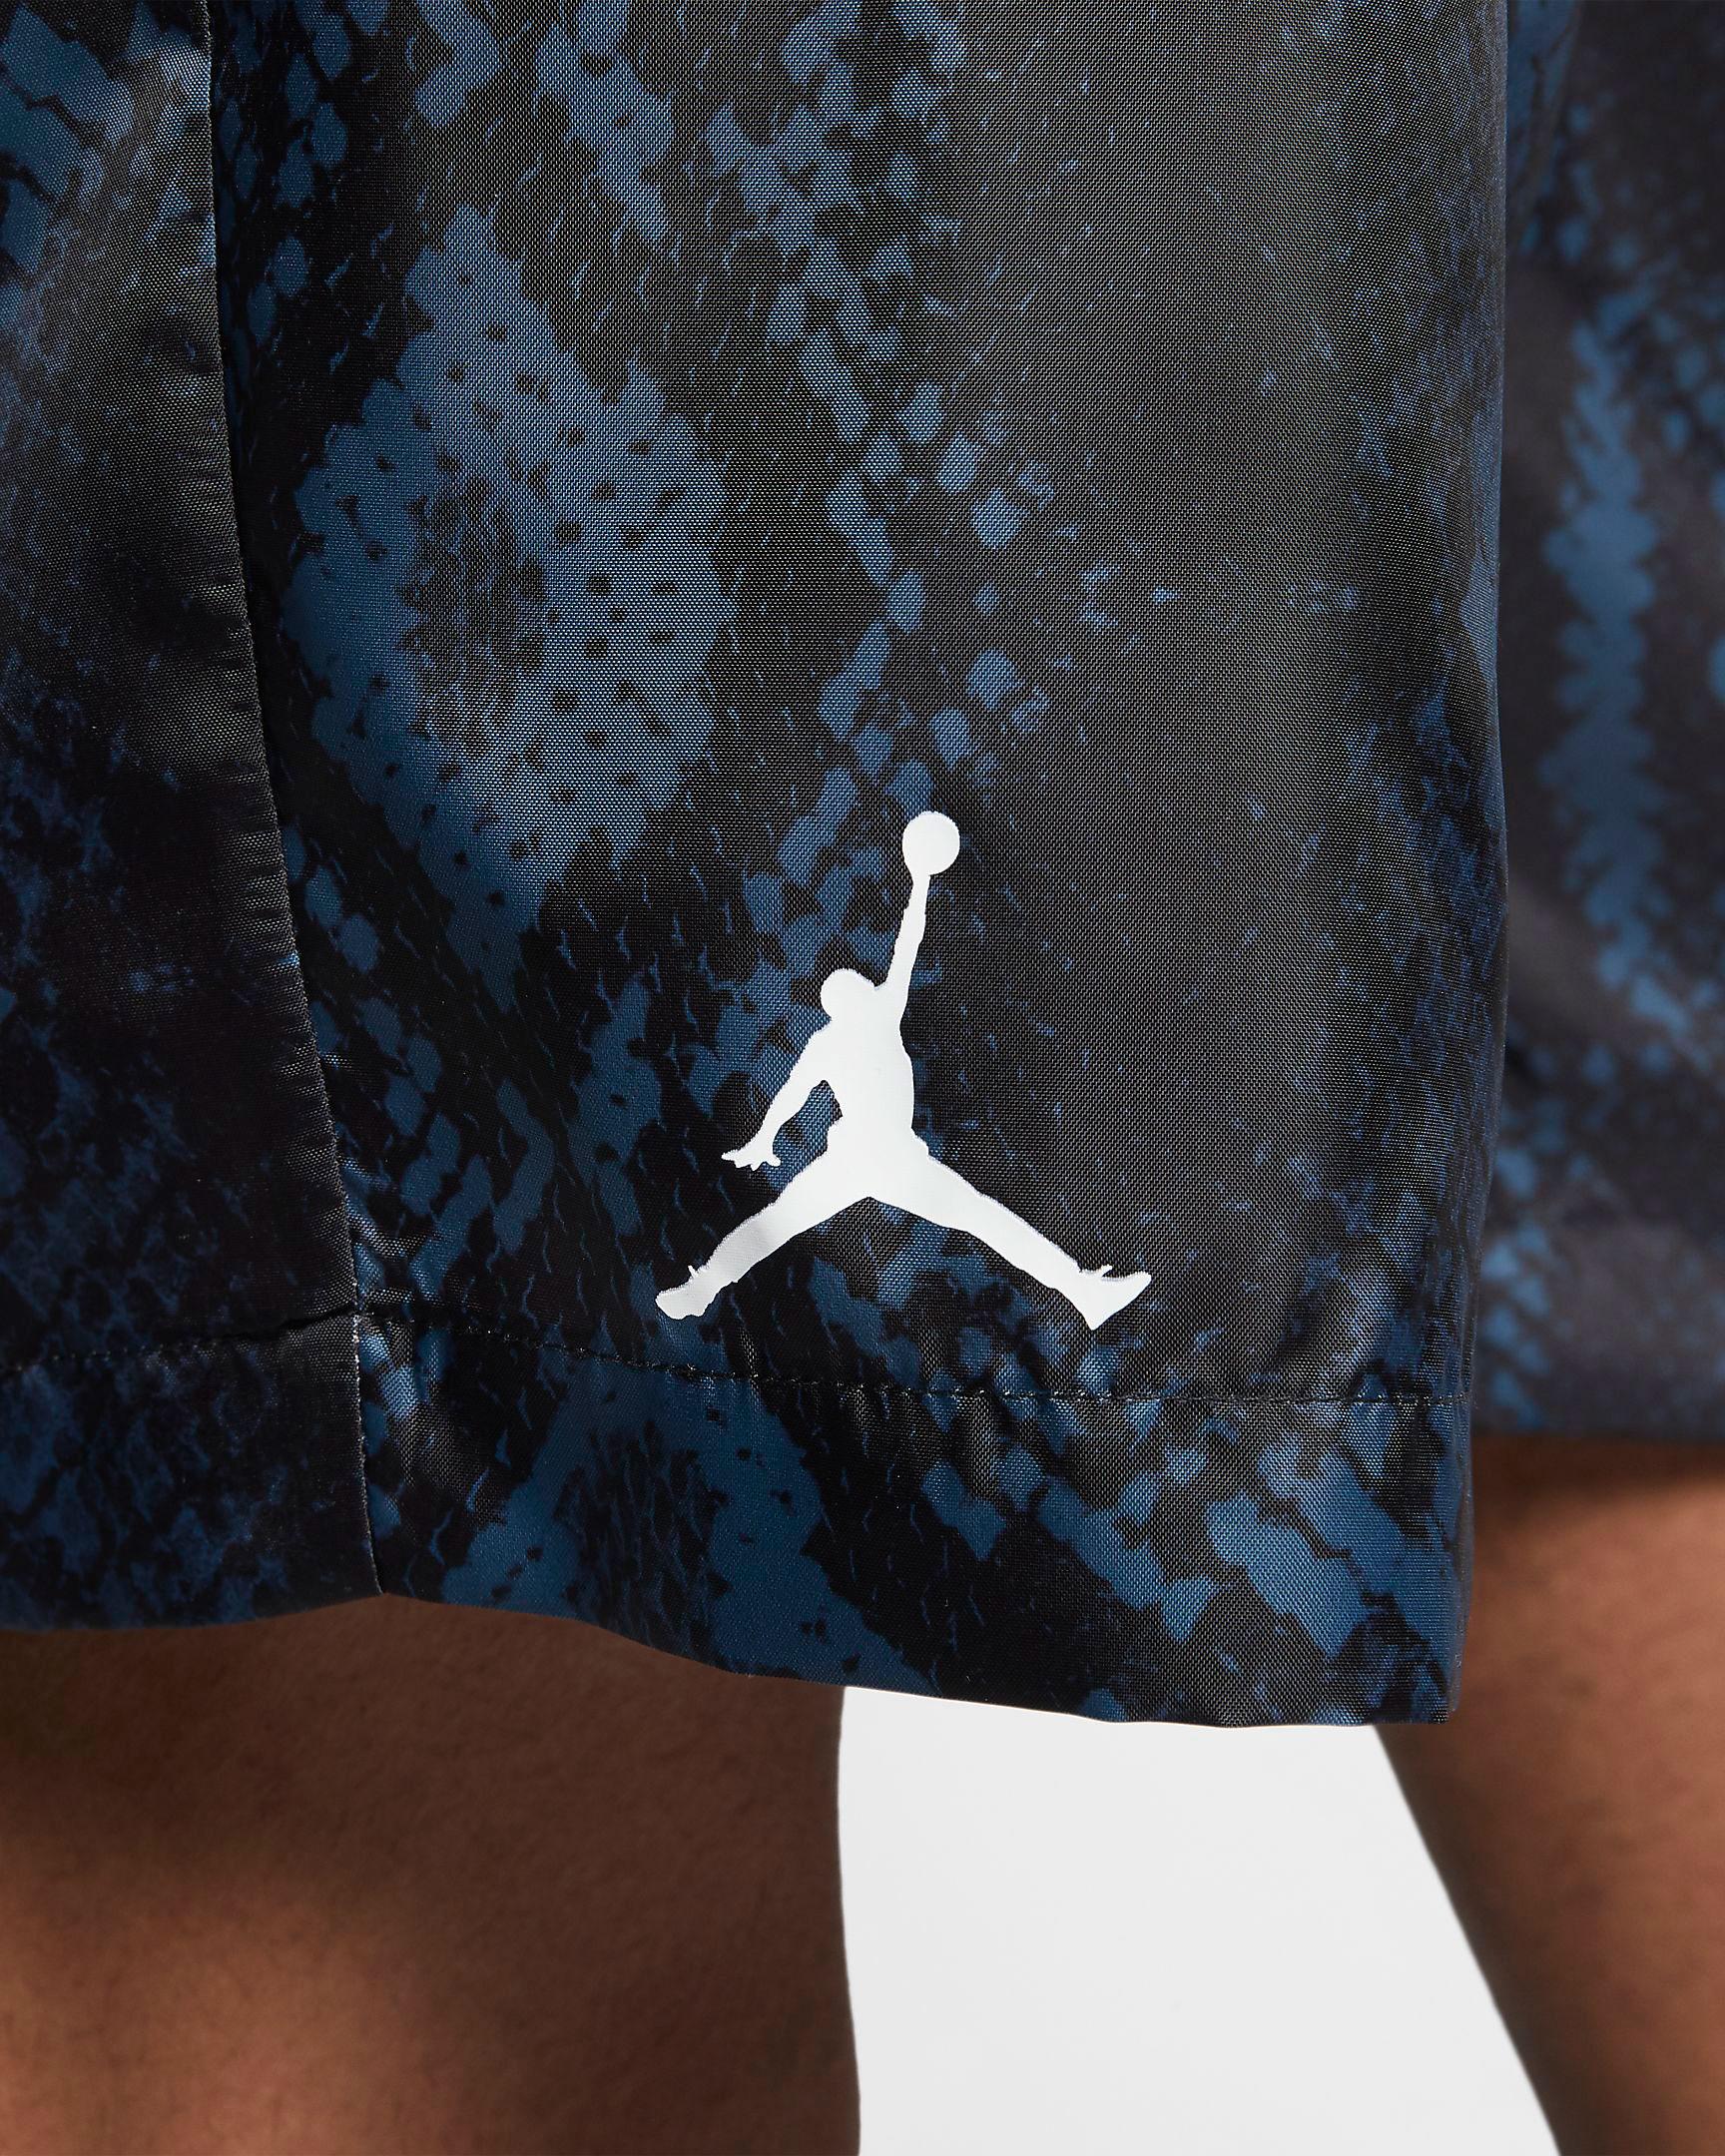 air-jordan-11-low-snakeskin-navy-blue-shorts-4